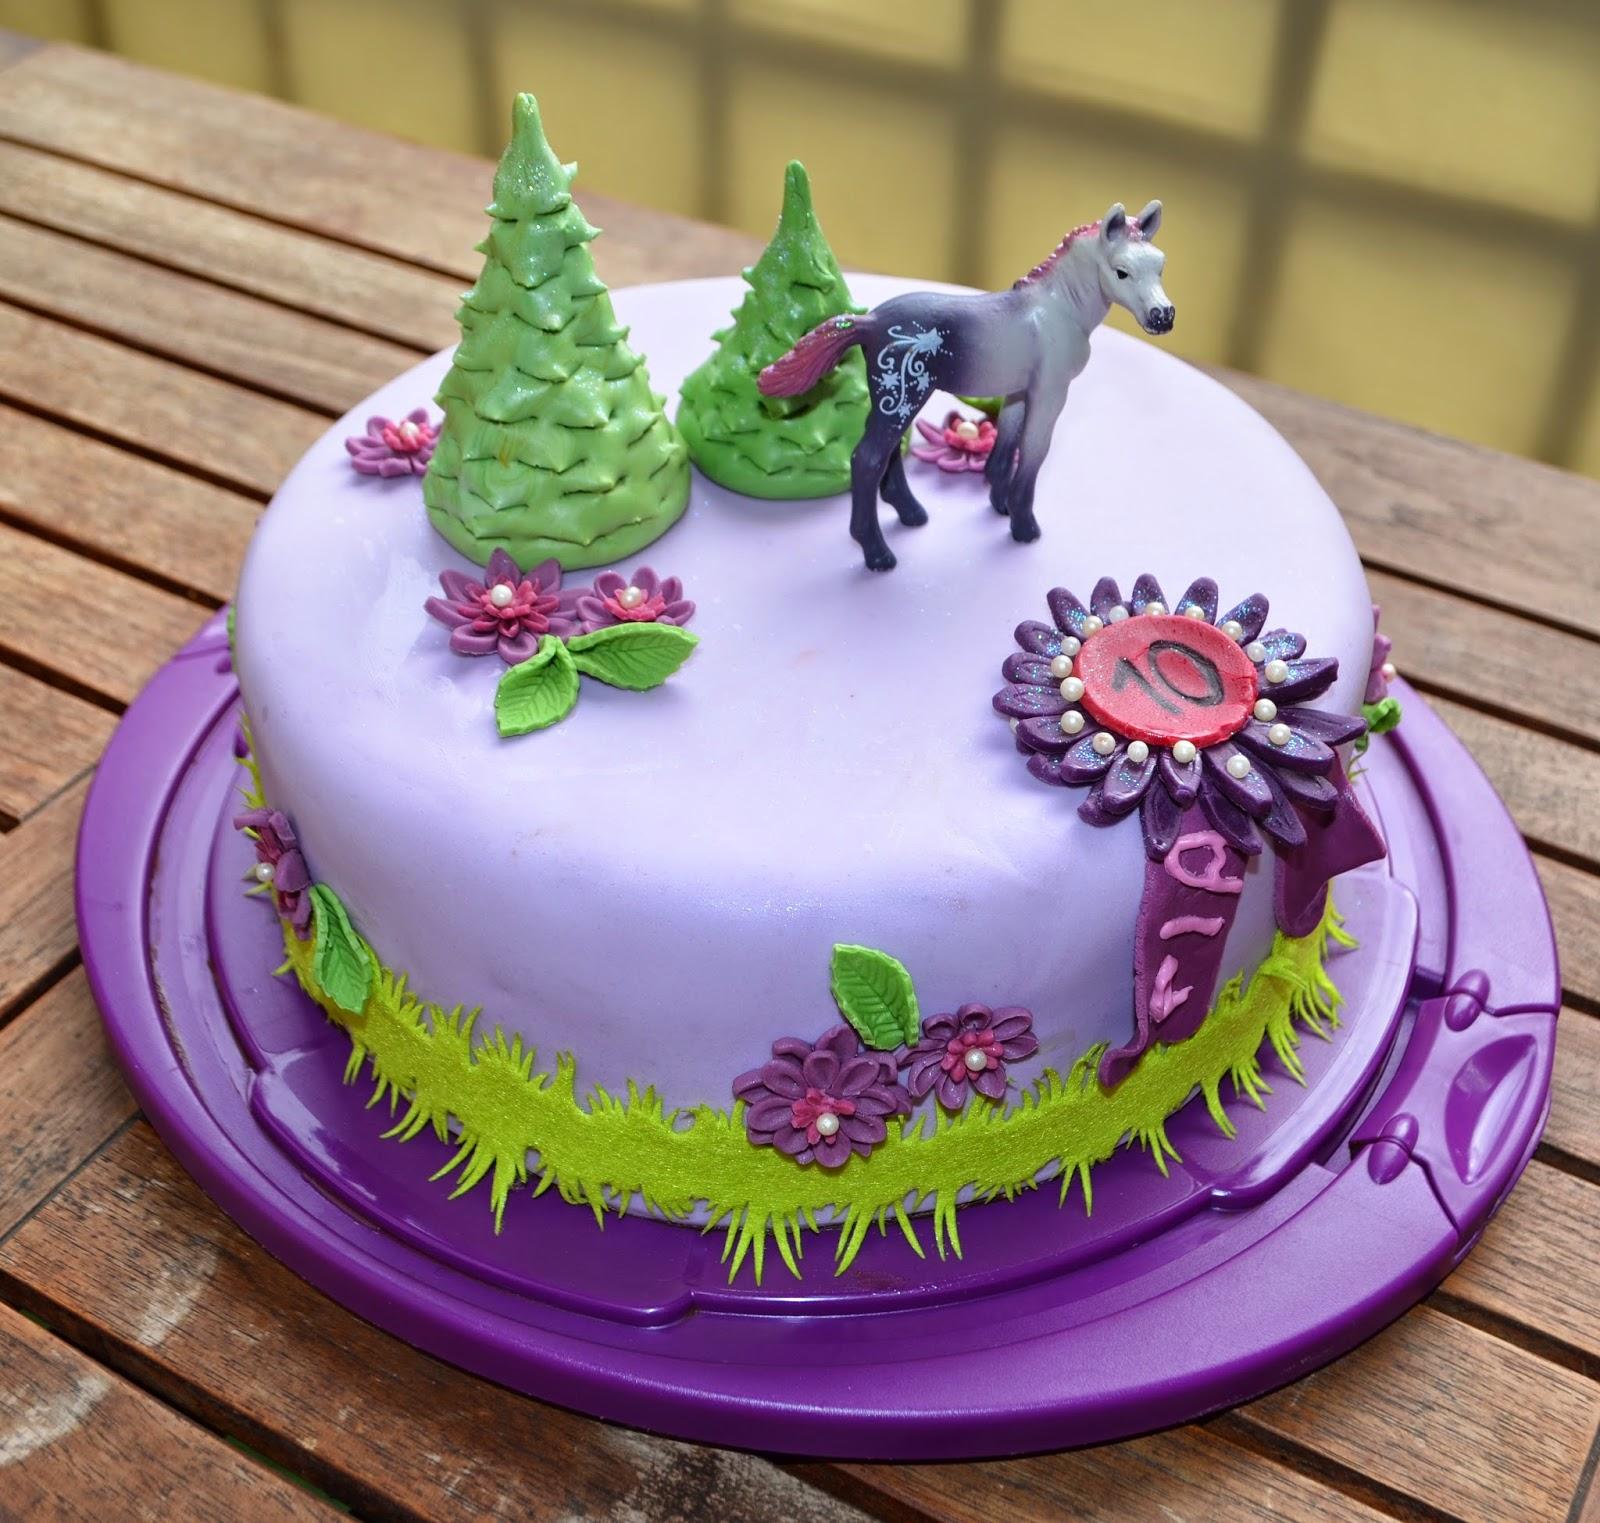 Aller Anfang Ist Pferde Geburtstags Torte